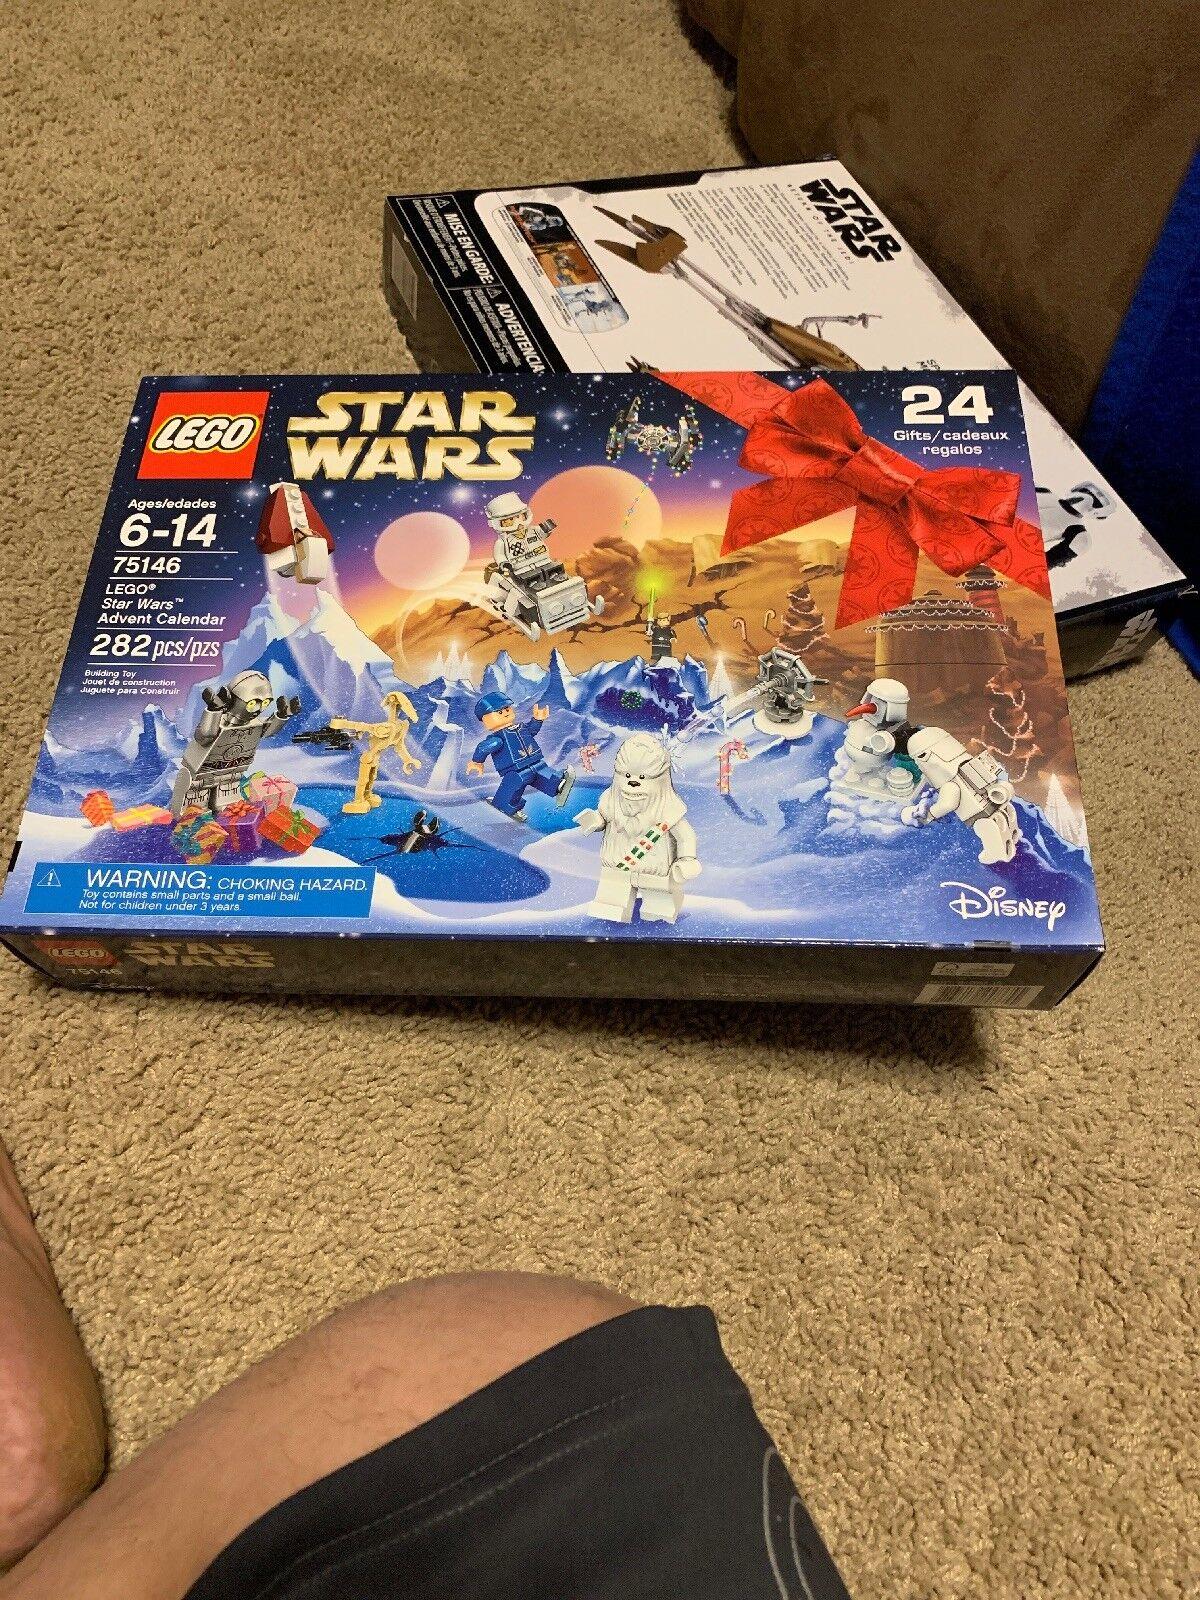 LEGO 2016 Star Wars Advent Calendar 75146 NEW Sealed In Box